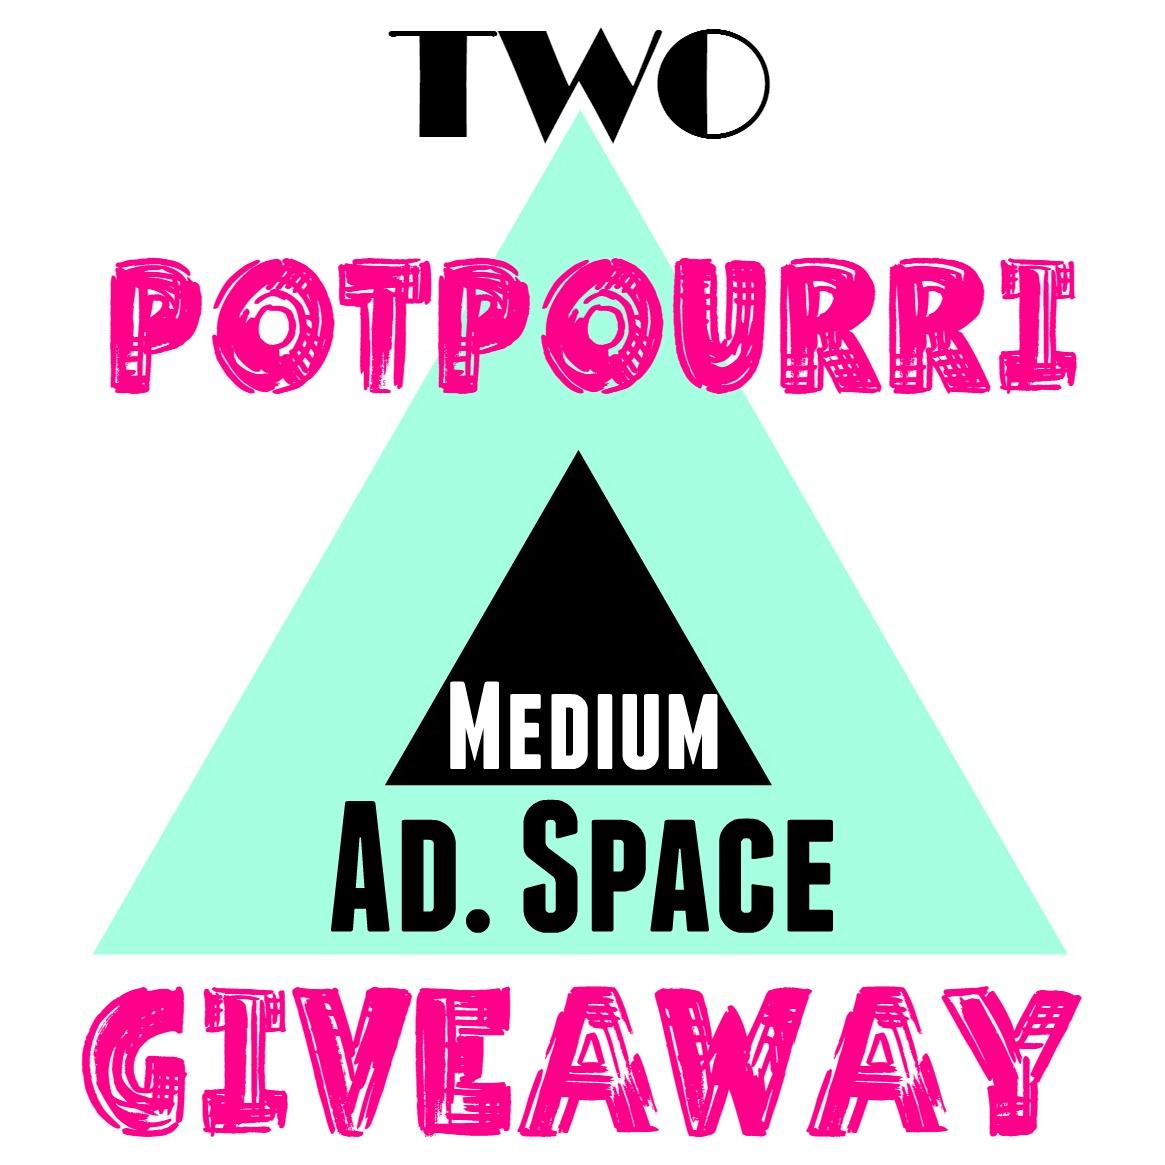 Potpourri Giveaway!